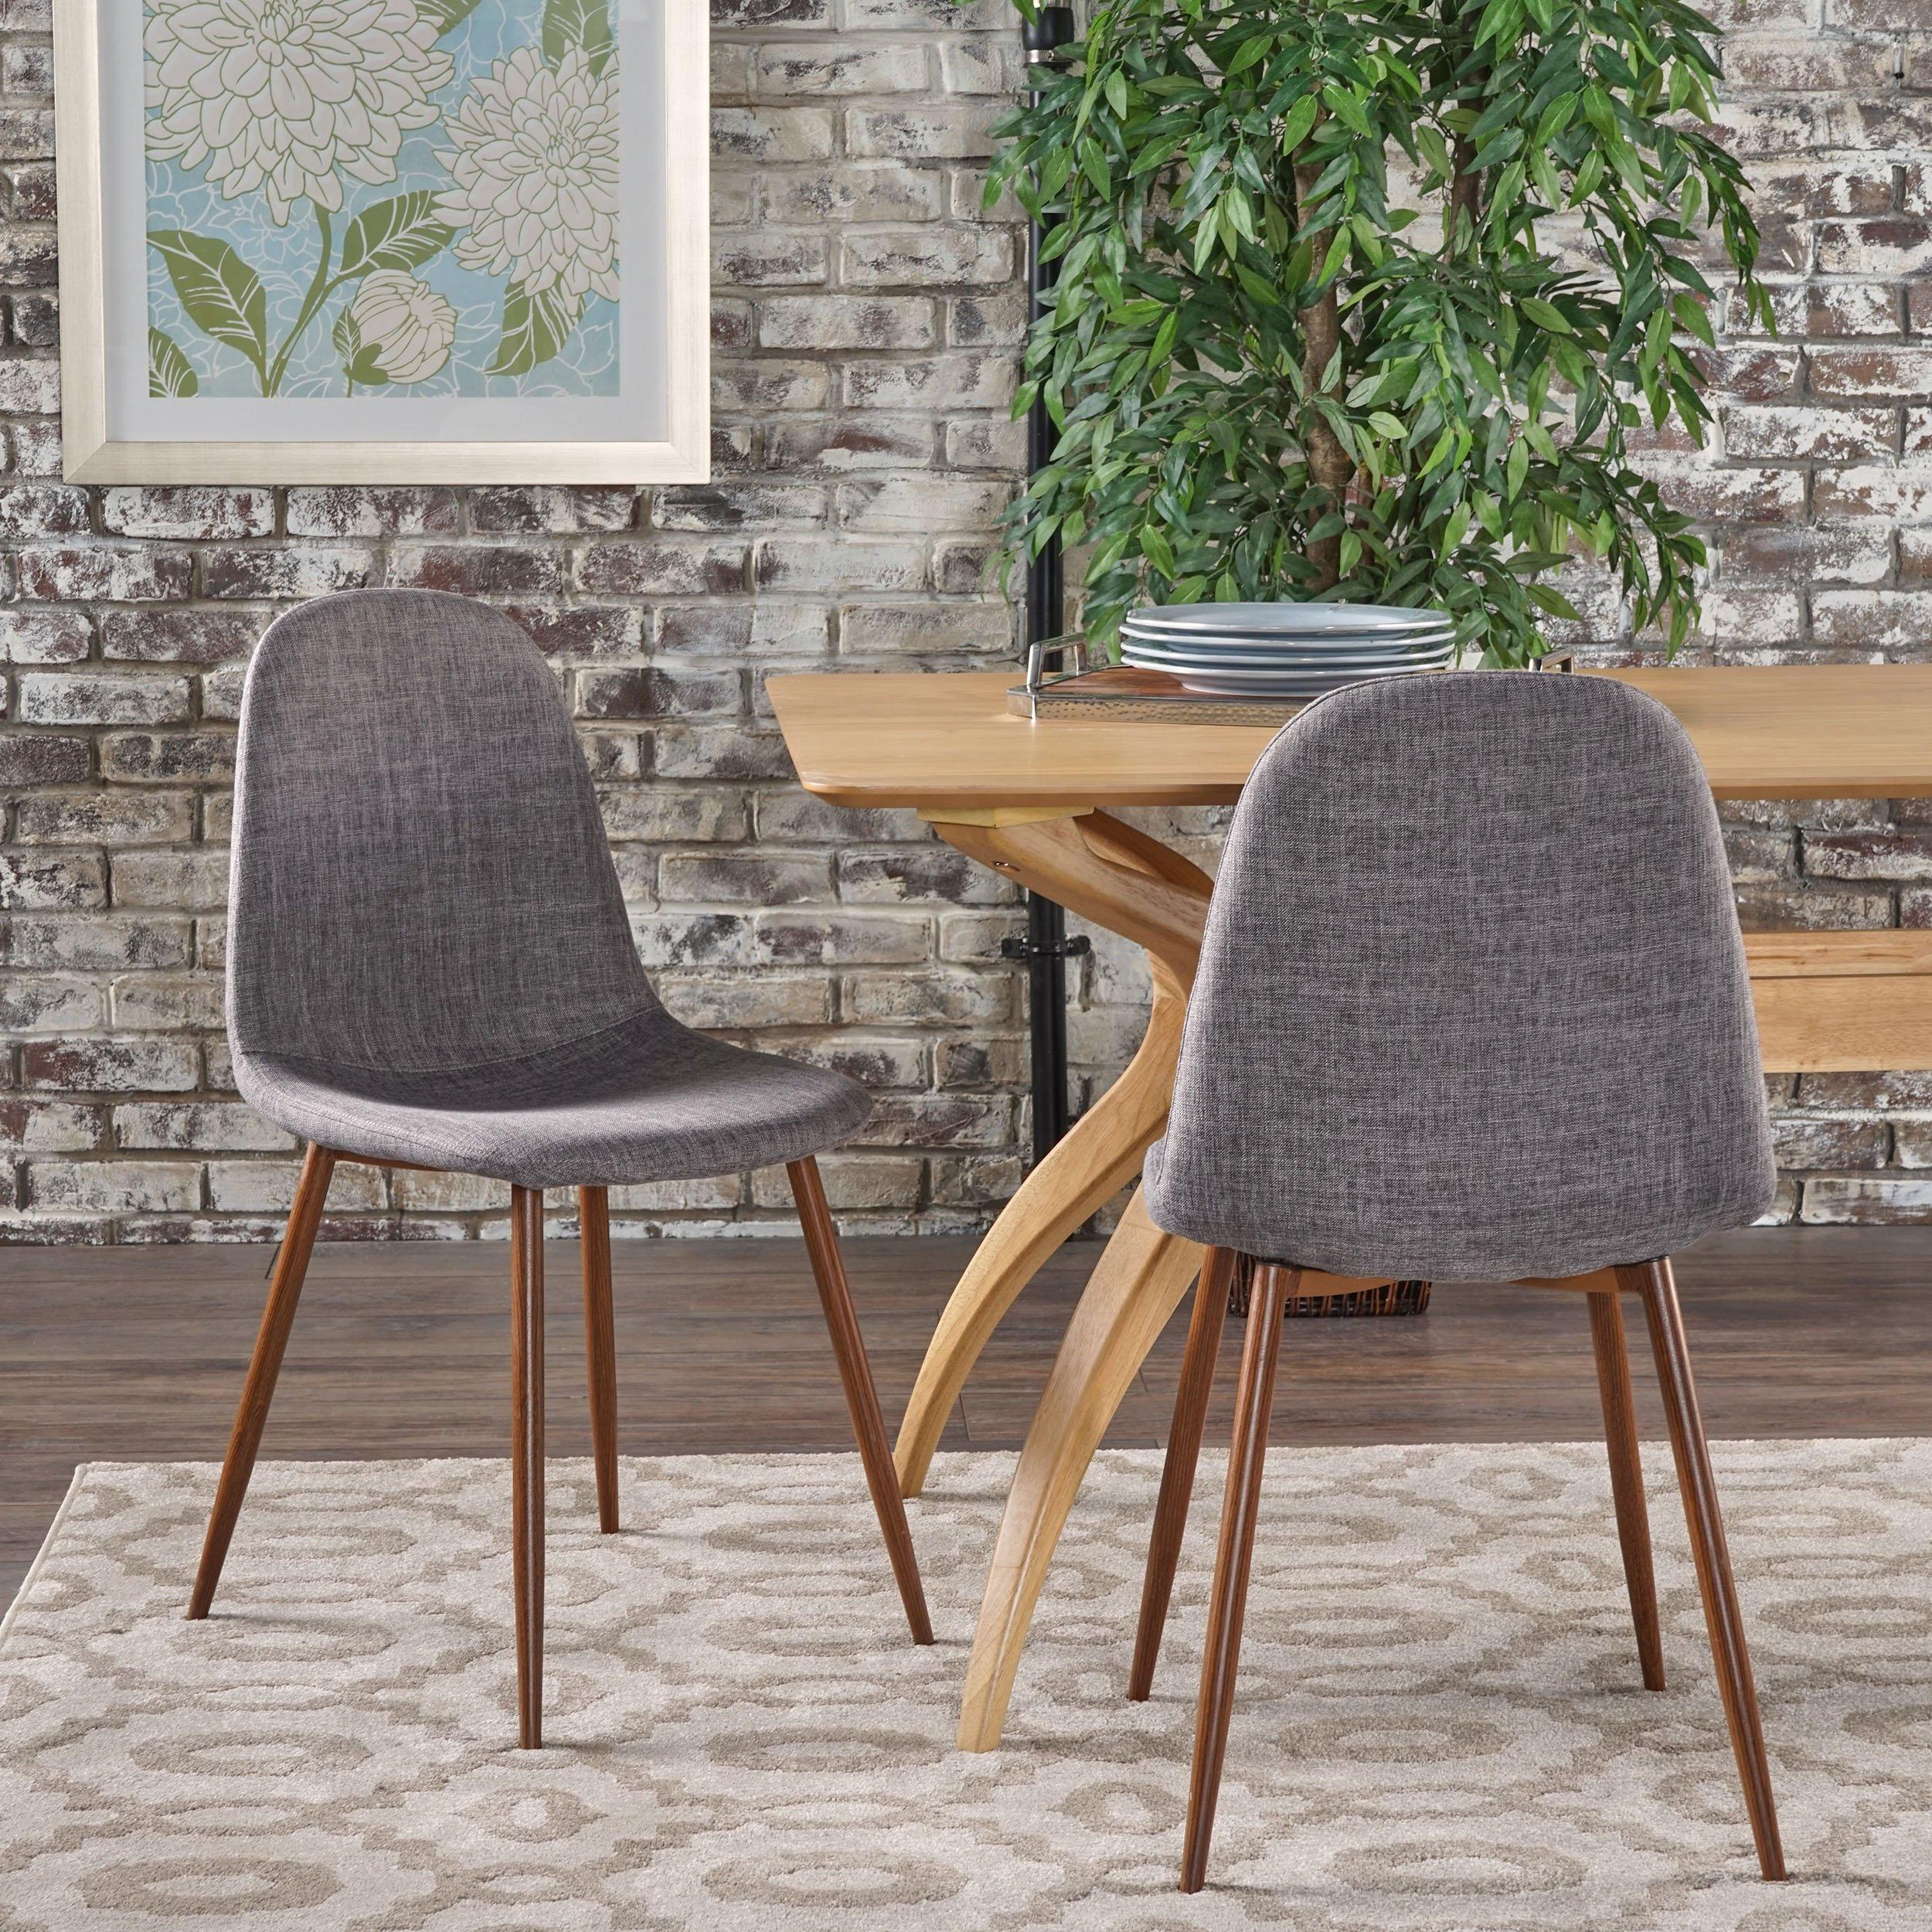 GDF Studio   Resta   Mid Century Modern Fabric Dining Chair   Set of 2   in Light Grey/Dark Brown by GDF Studio